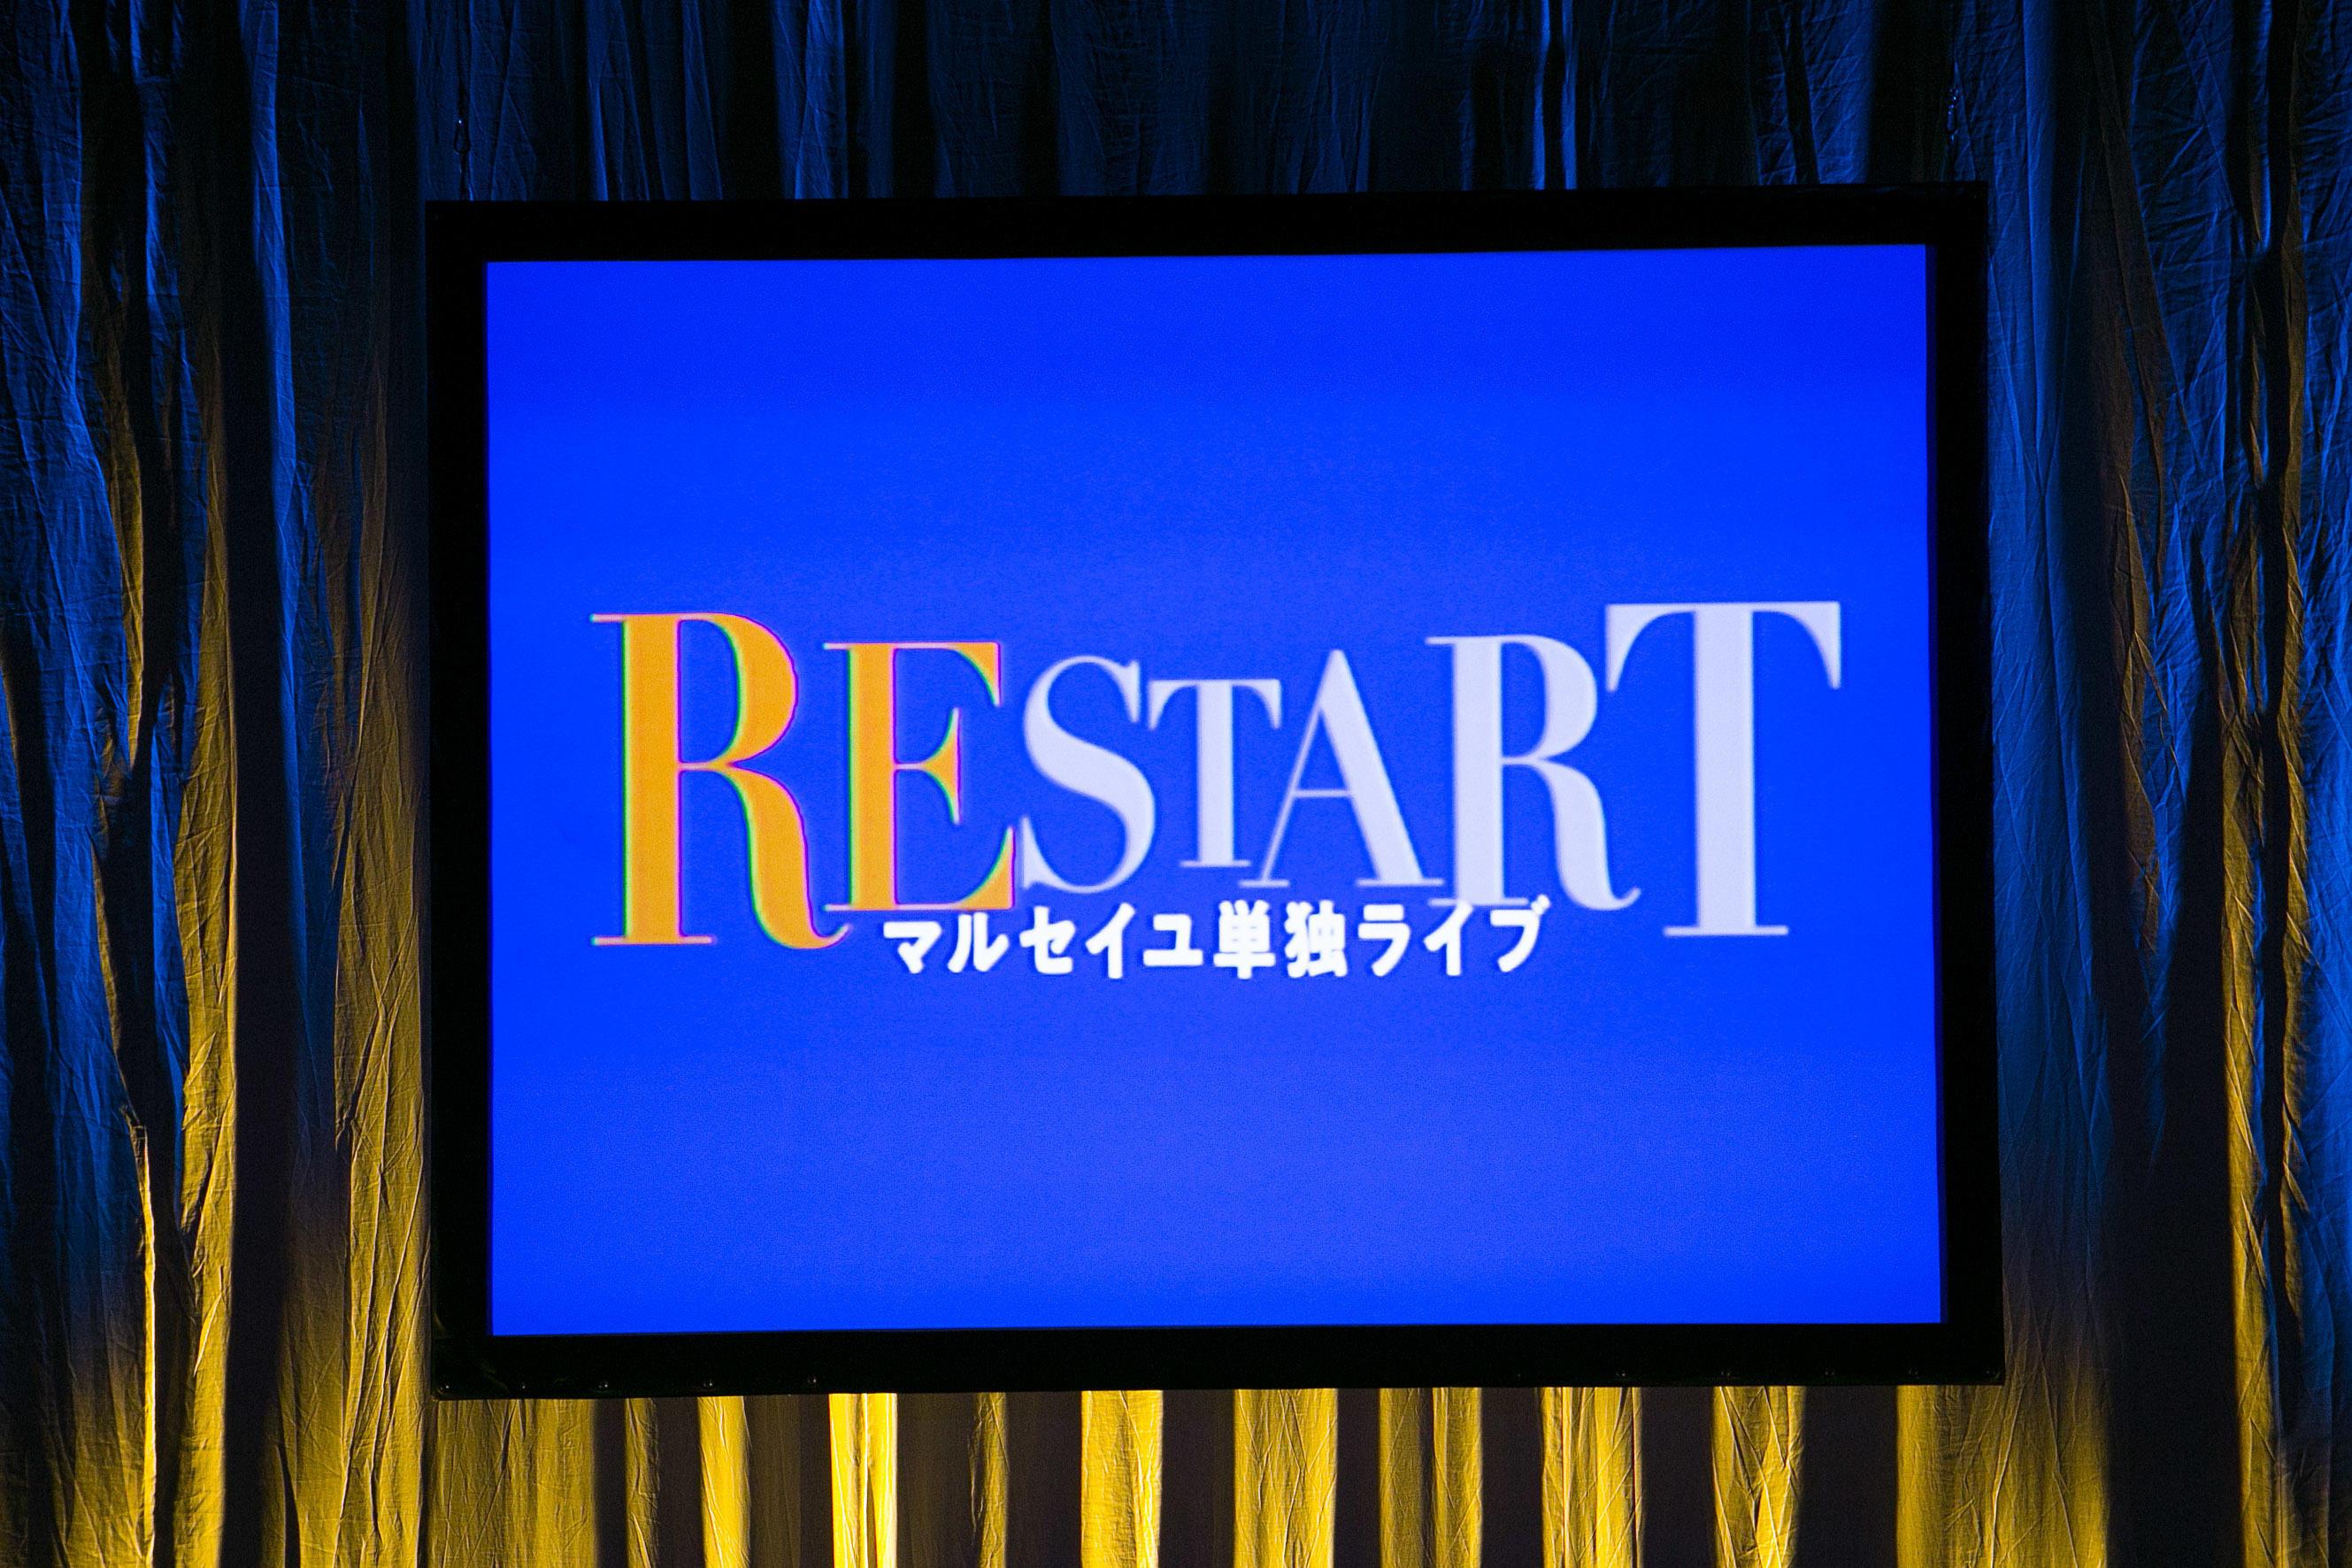 http://news.yoshimoto.co.jp/20180430214622-9f5a762d974aa32034af1f5e0efc1a5bcf9142c1.jpg